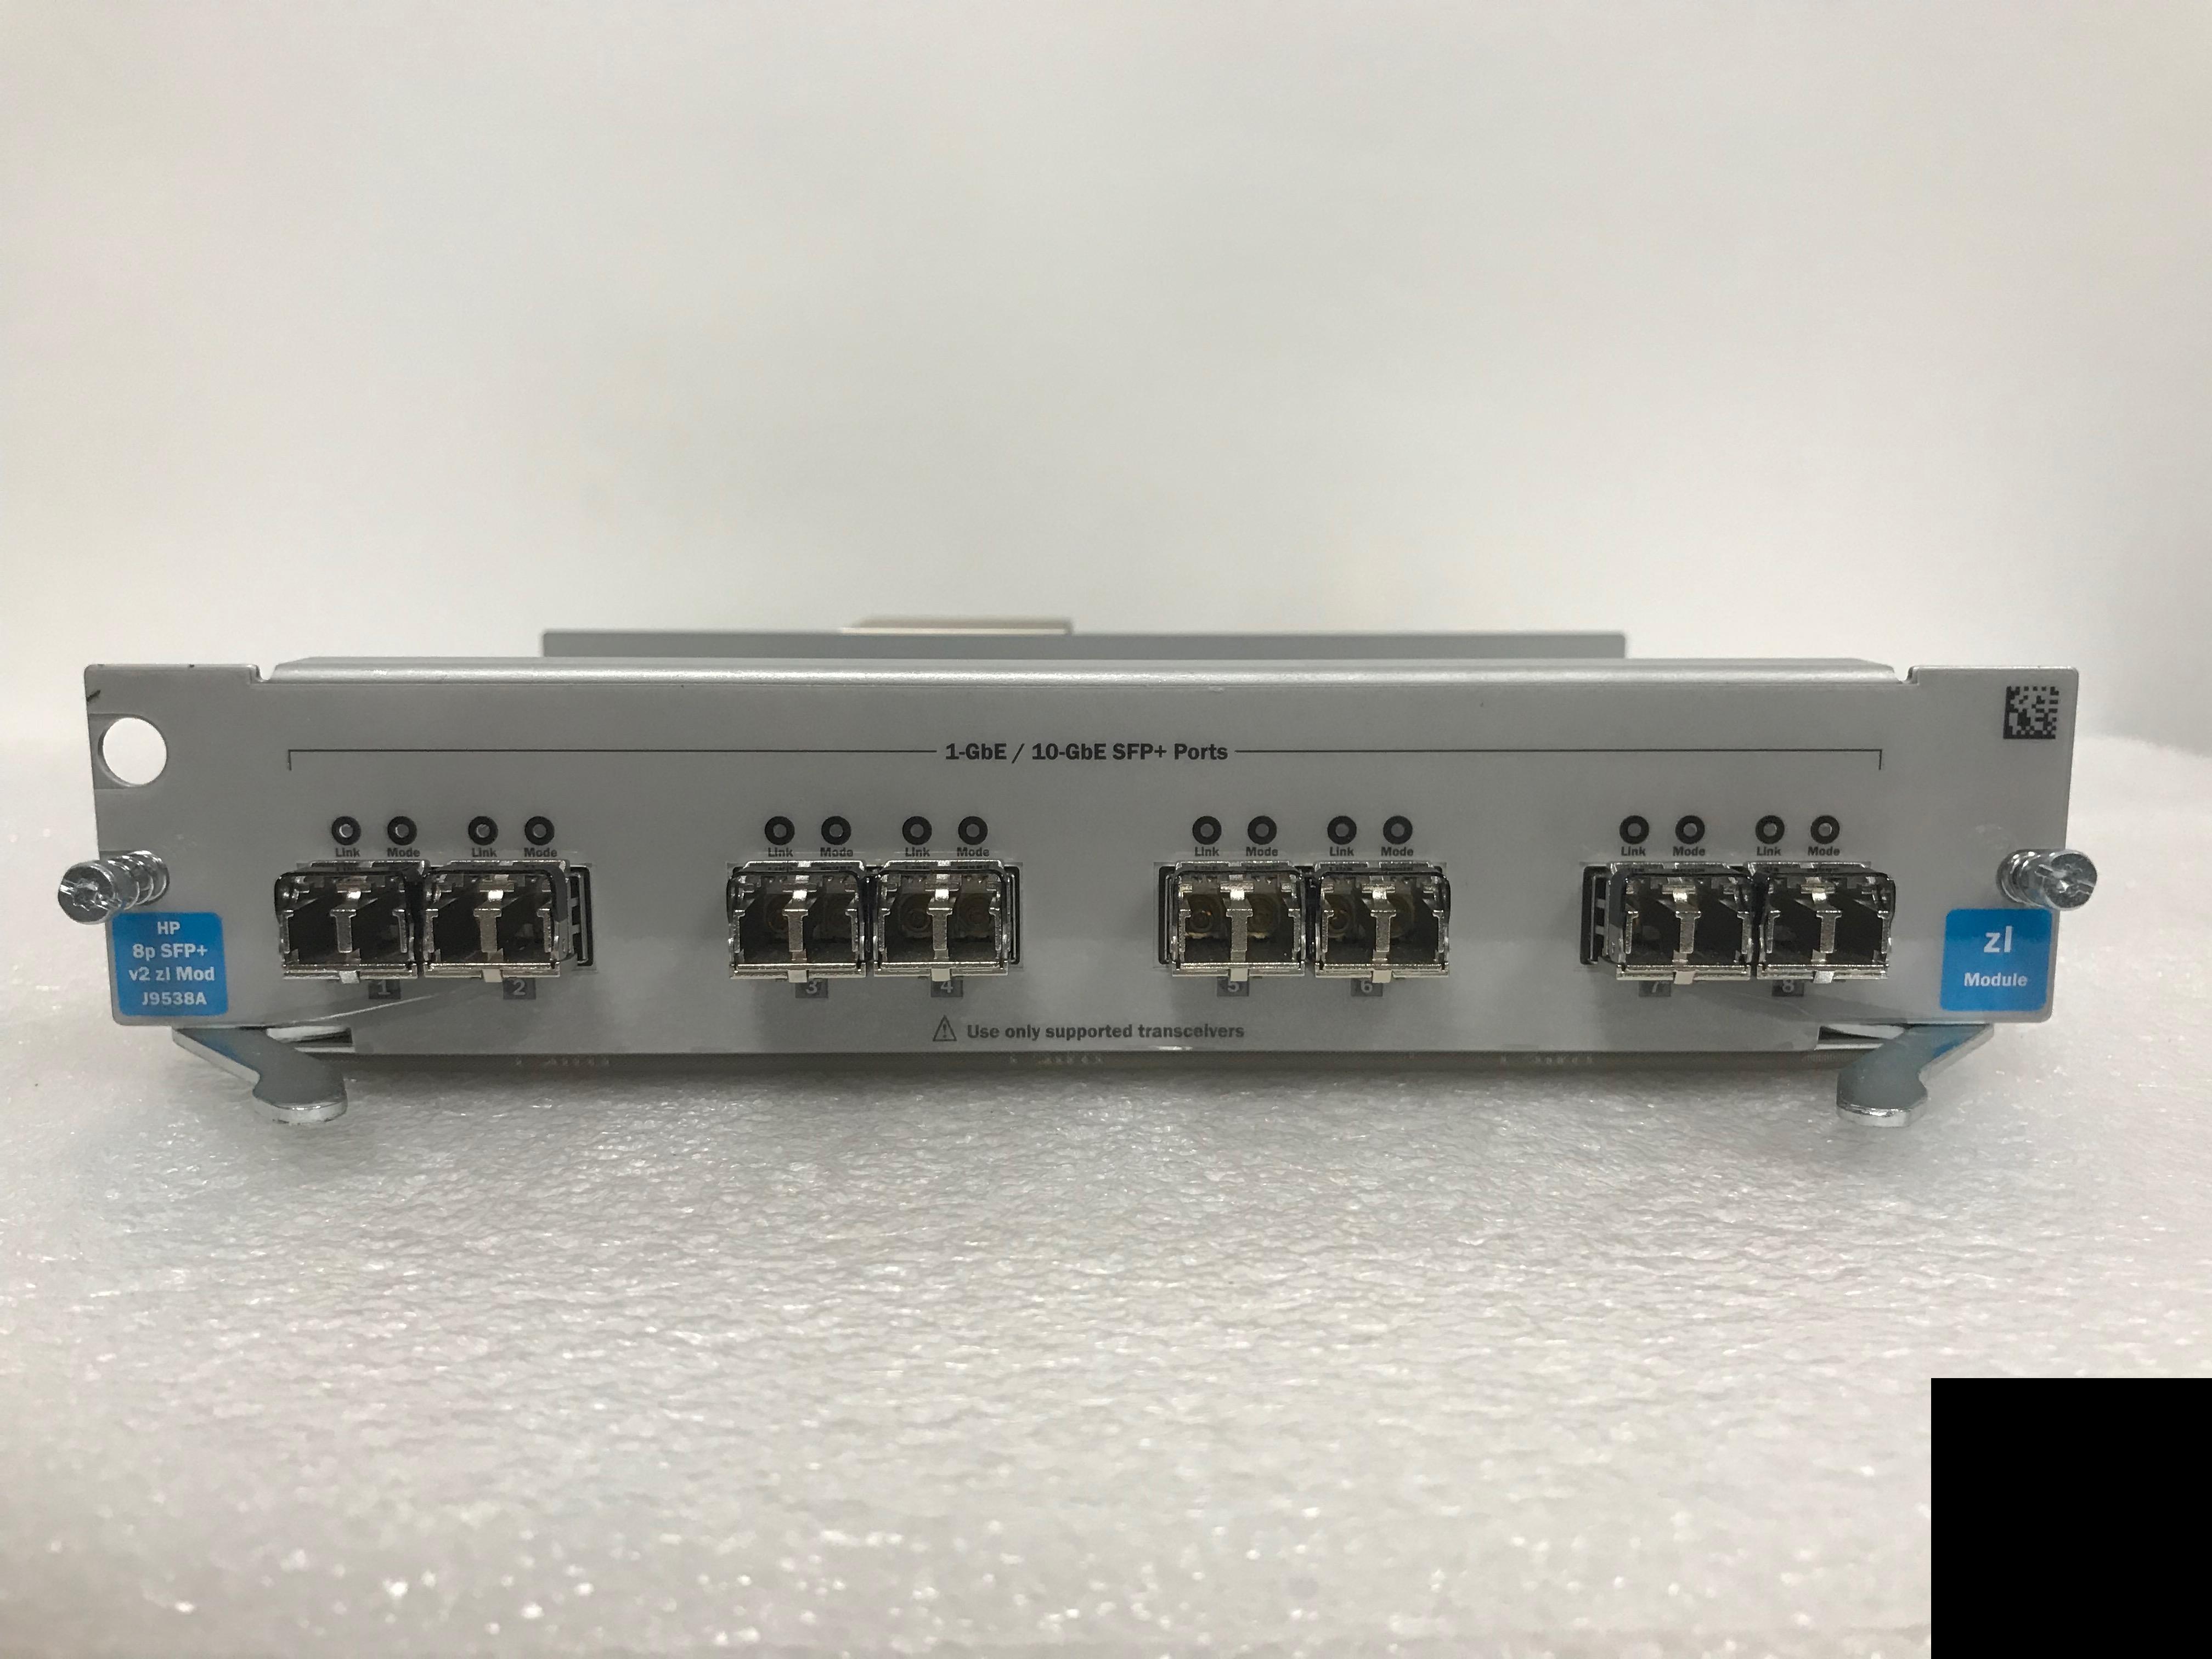 Aruba/HPe Procurve zl Switch modules for sale - Off Topic